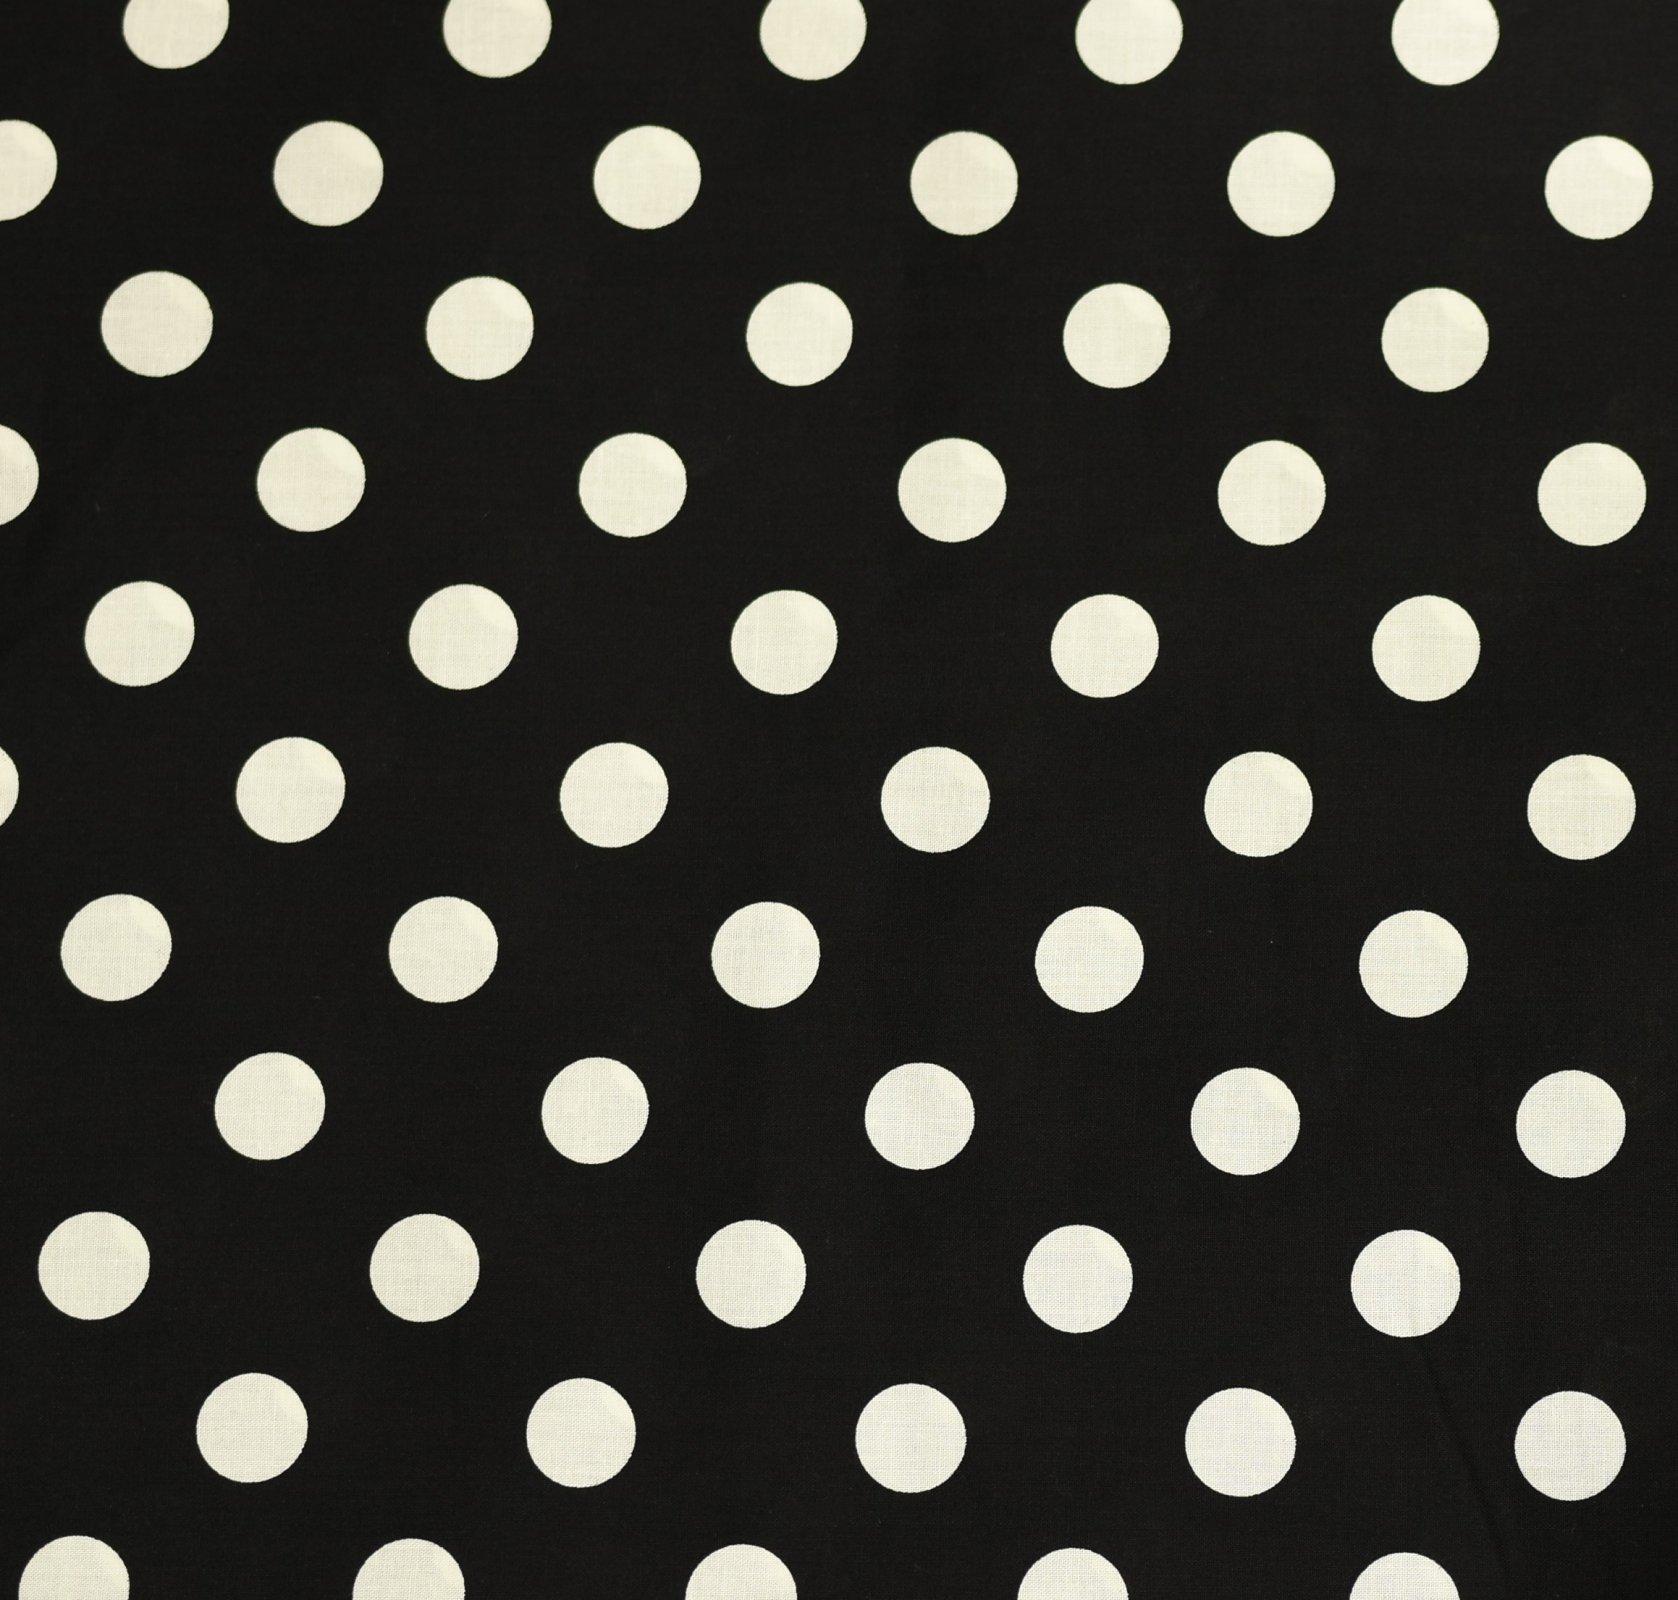 Japanese Fabric - Color Cocktails - Spots - Black/Cream